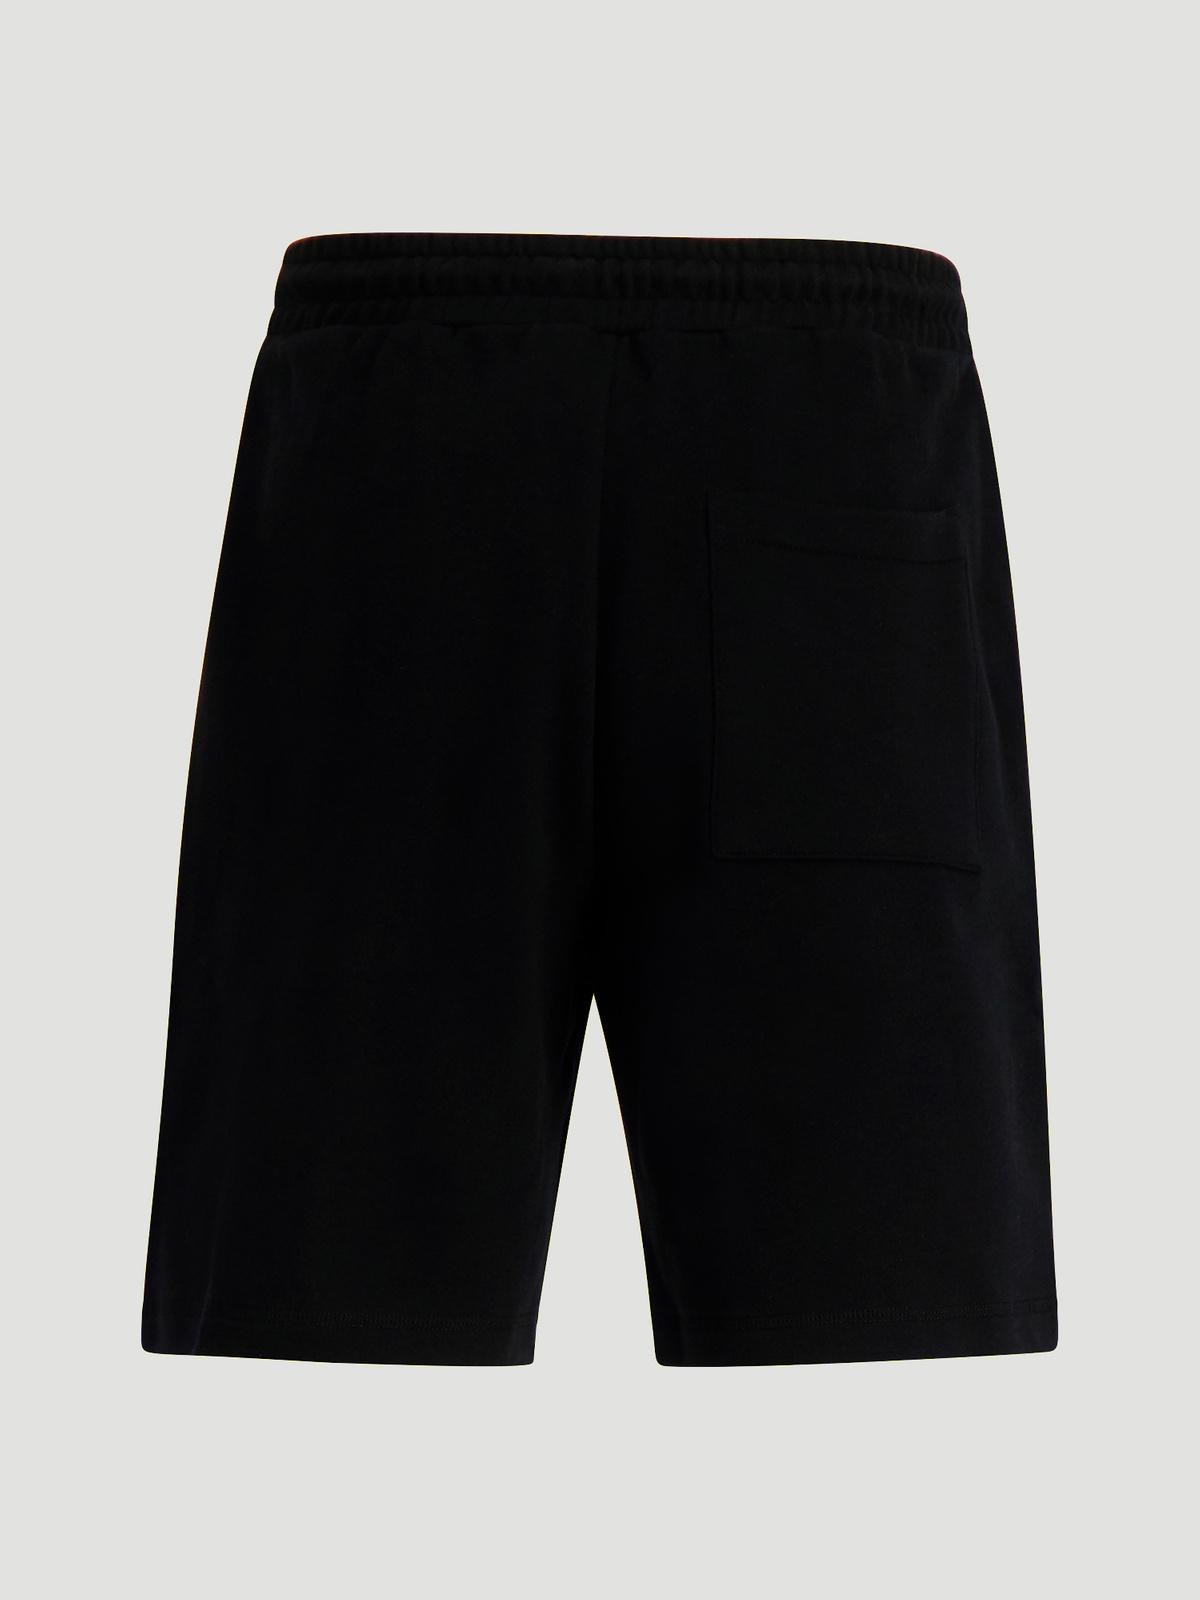 M. Oslo Shorts Black 7